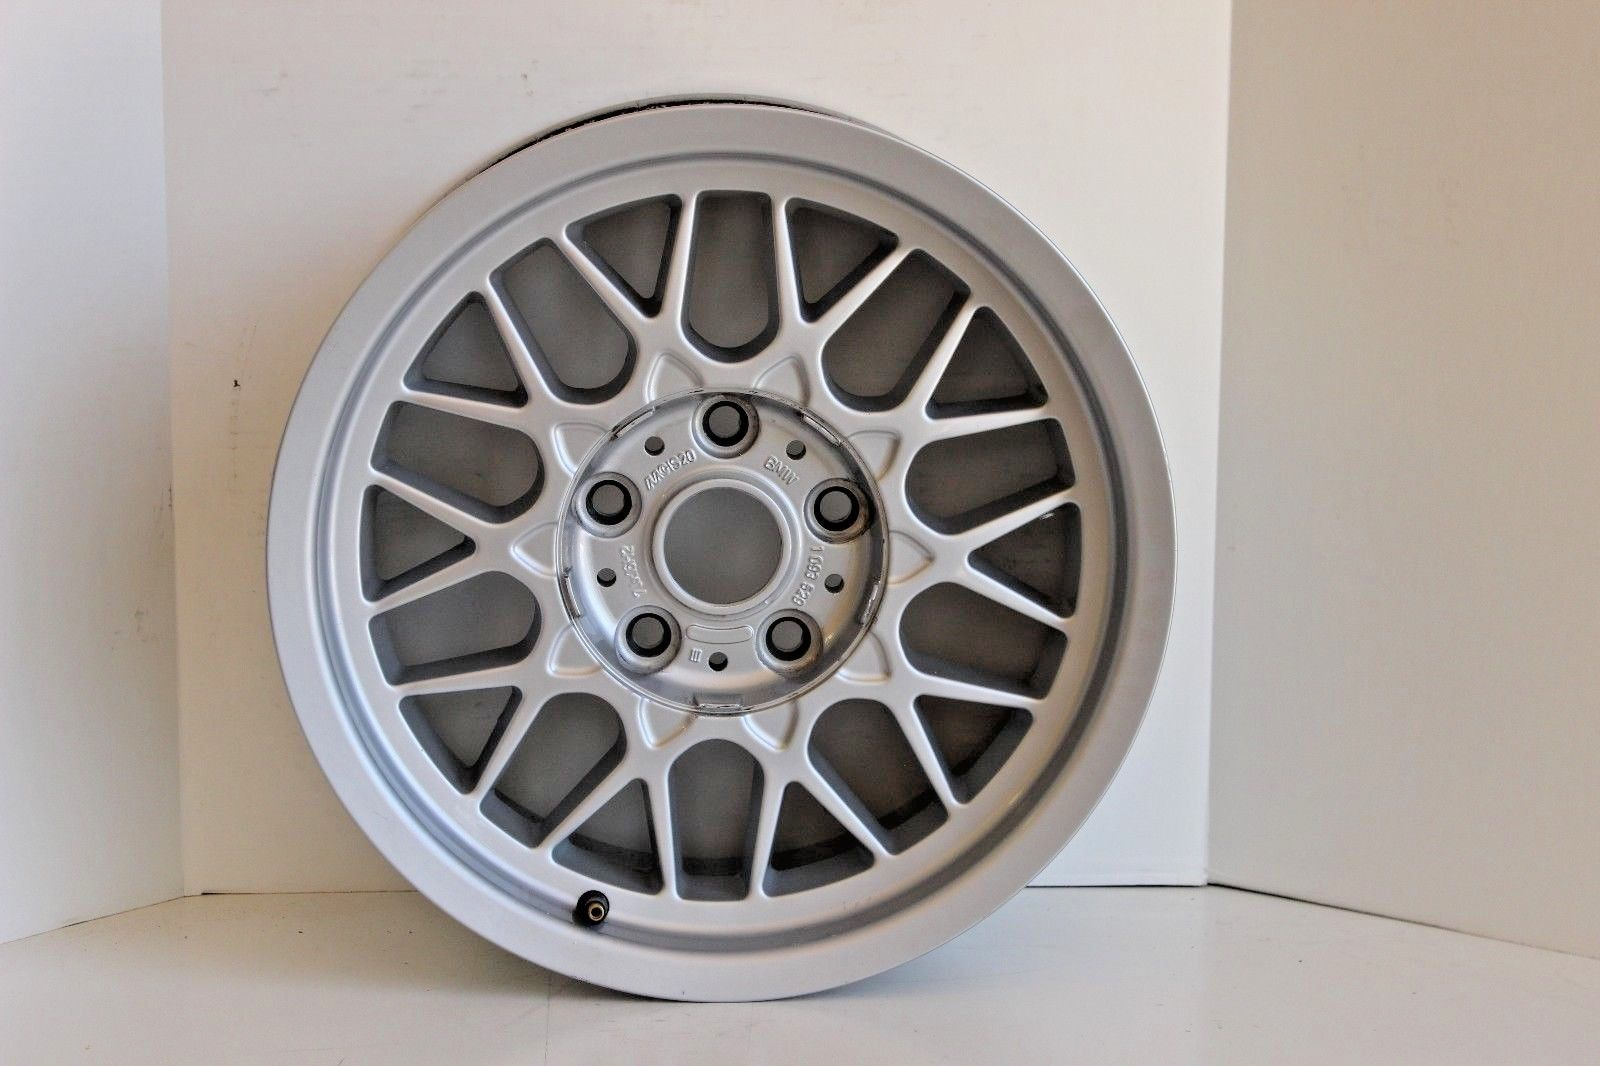 hight resolution of 1997 2003 bmw 525i 528i 530i 540i 16 7 bbs keystone web alloy wheel oem 59250